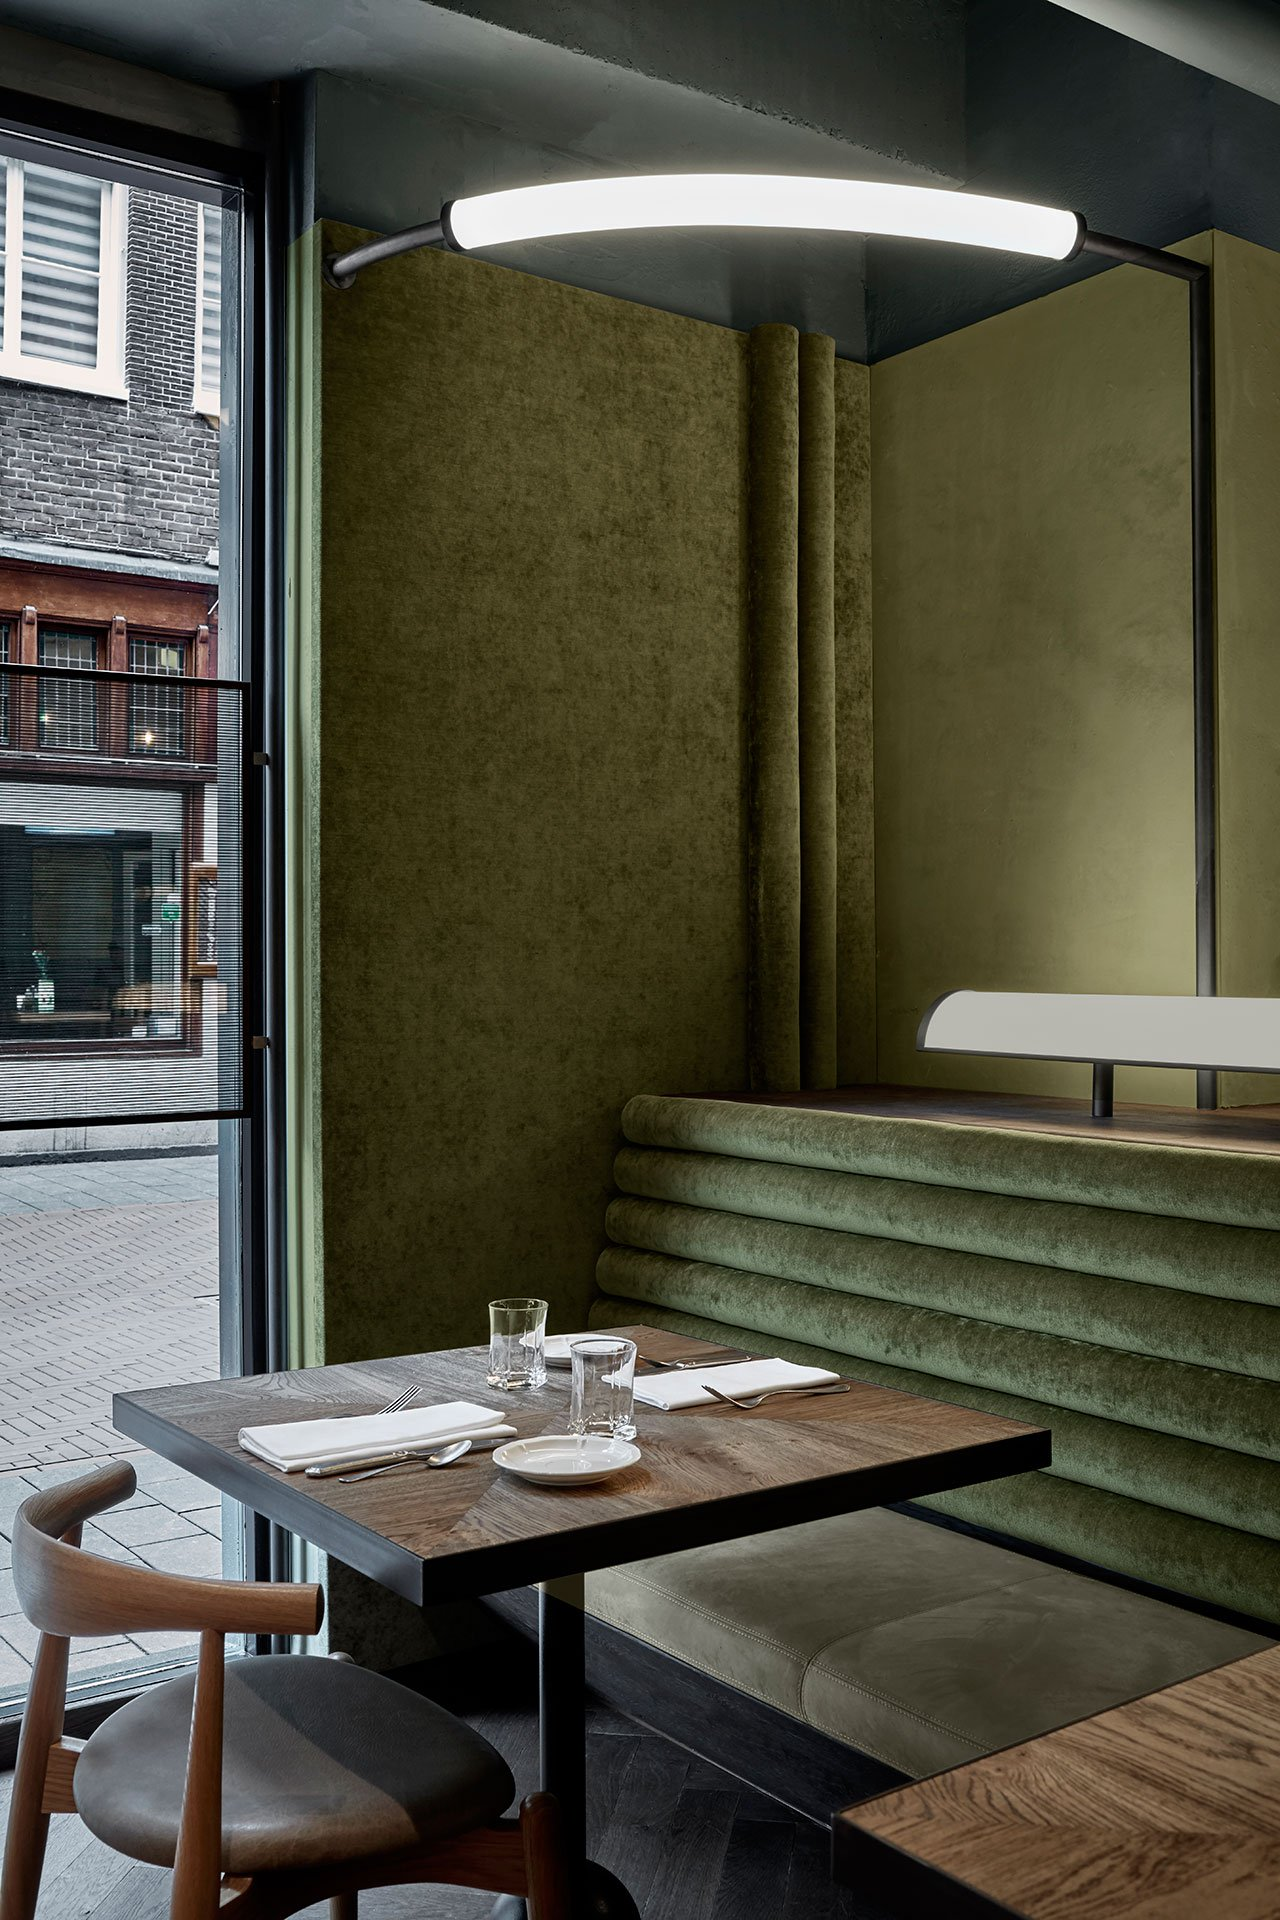 s4_restaurant_wyers_and_miss_louisa_amsterdam_the_netherlands_studio_modijefsky_yatzer.jpg